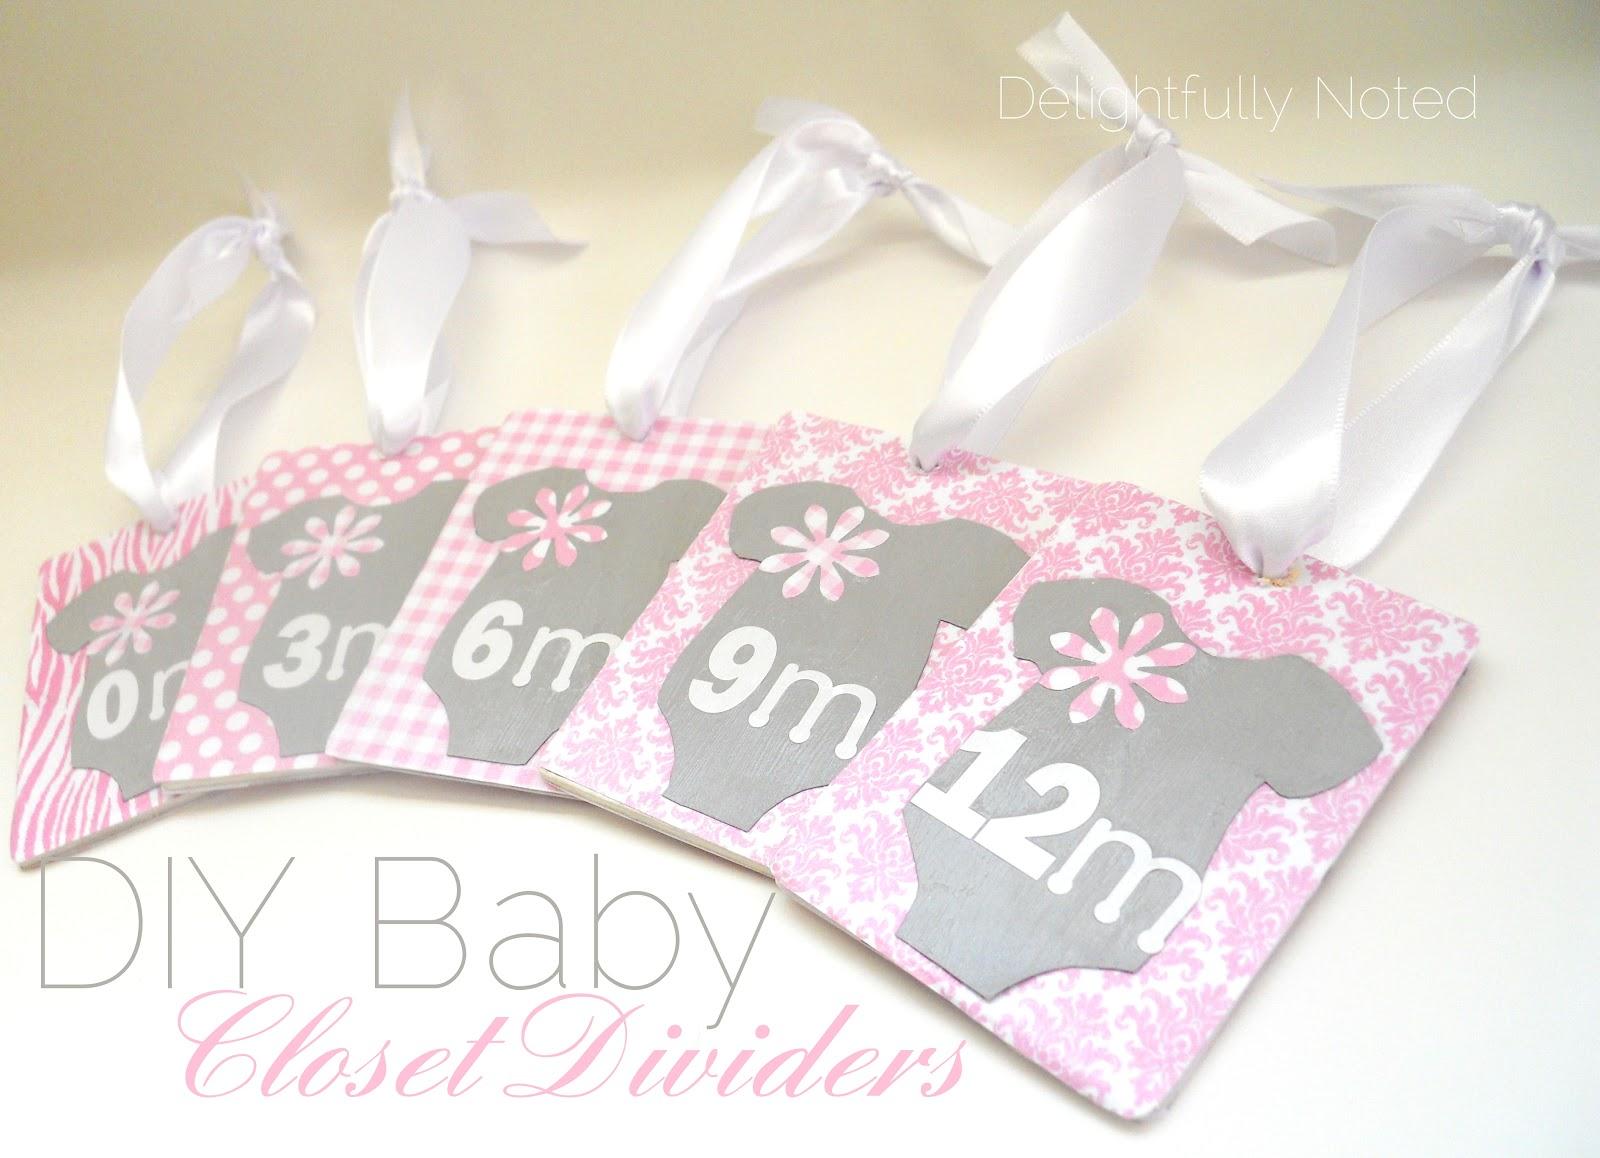 Handmade Baby Gifts: DIY Baby Closet Dividers ...